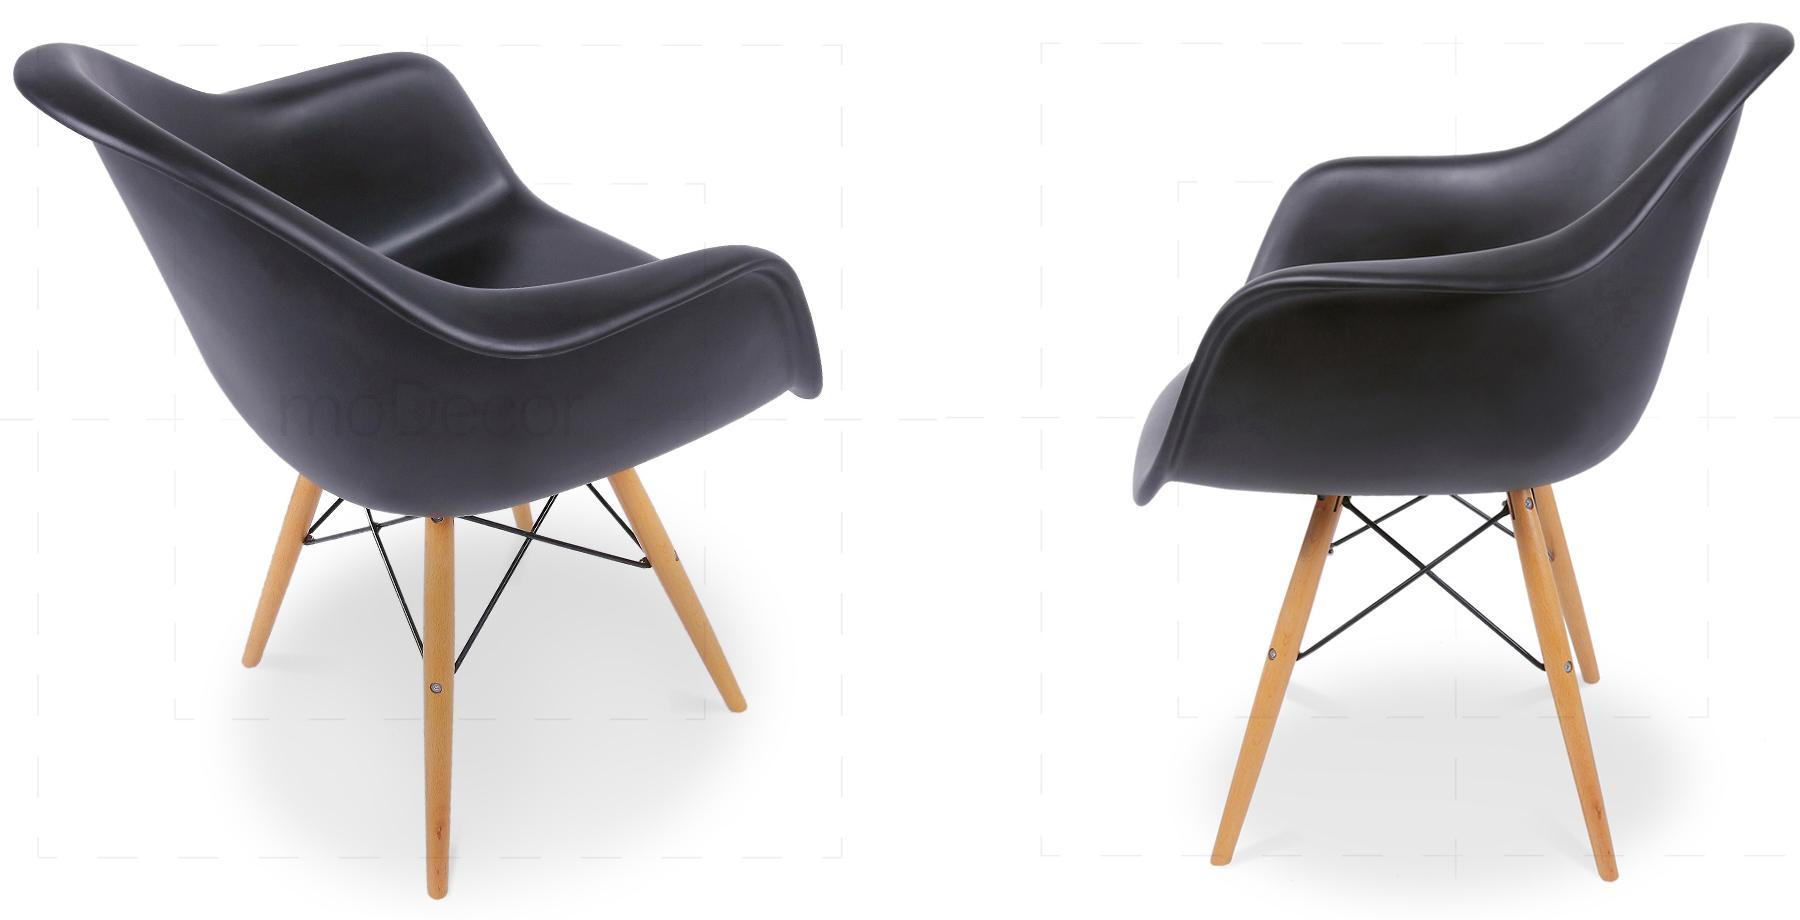 2er set eames daw stuhl in schwarz modecor hochwertige for Daw stuhl gepolstert